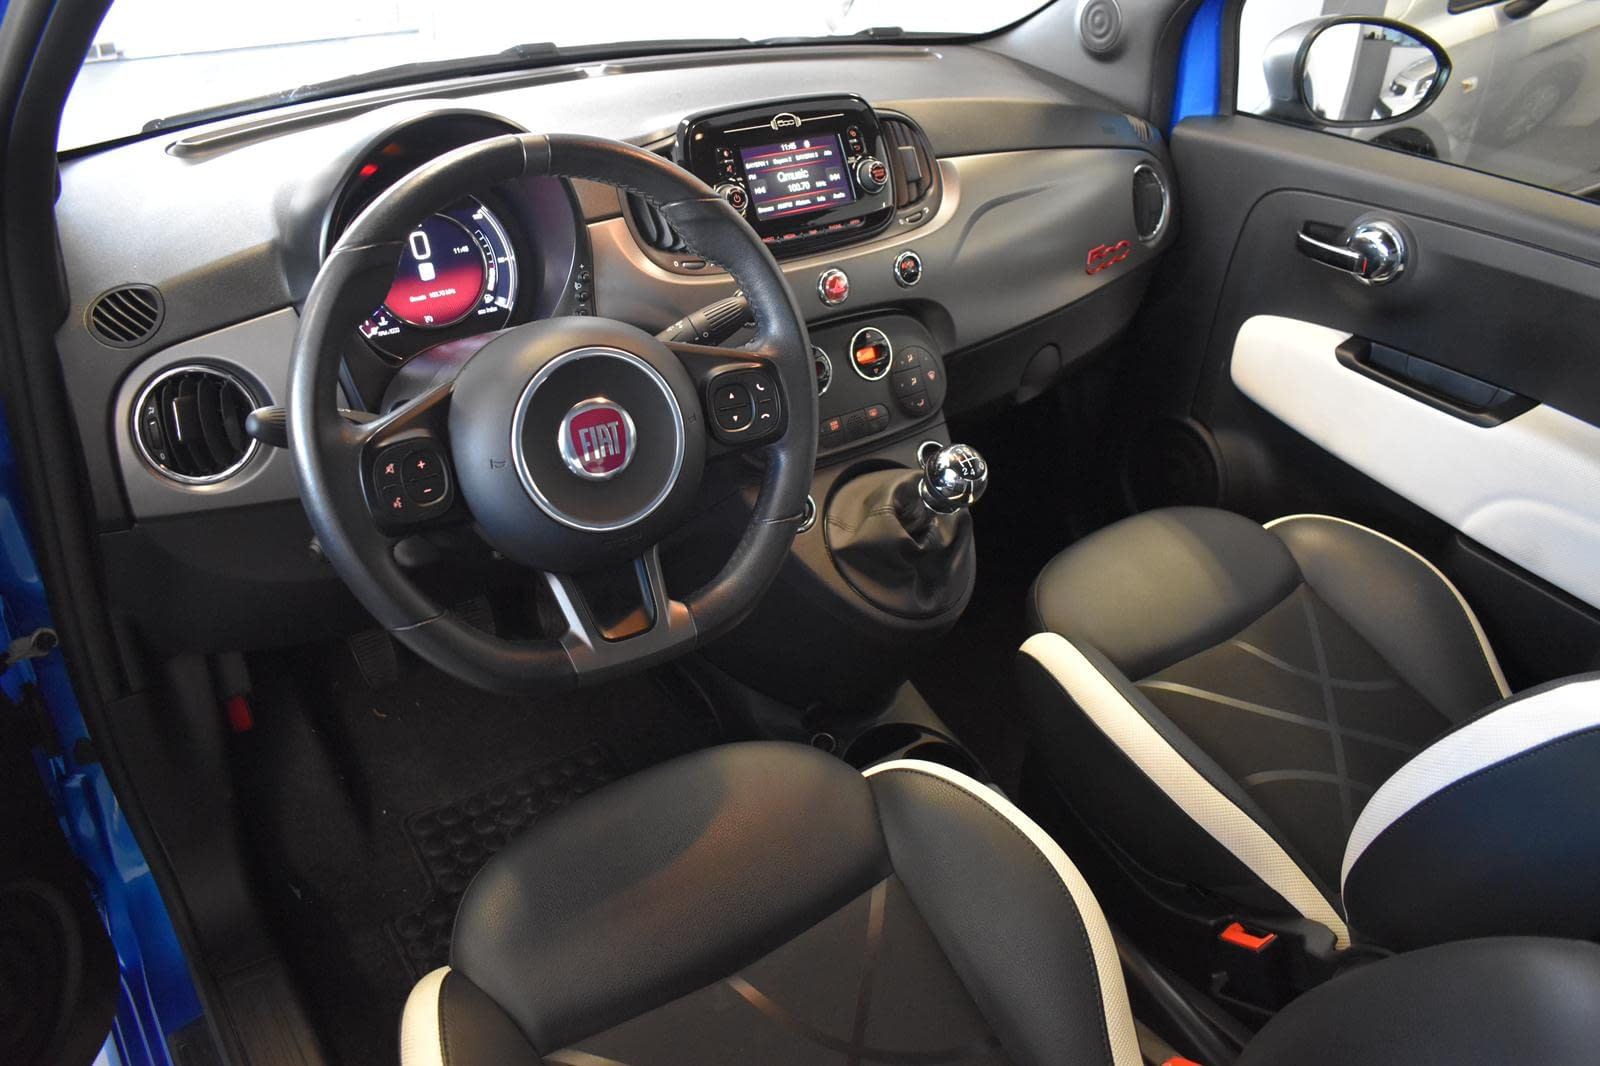 Fiat 500s Sport 1.2 Uconnect/Clima/XENON